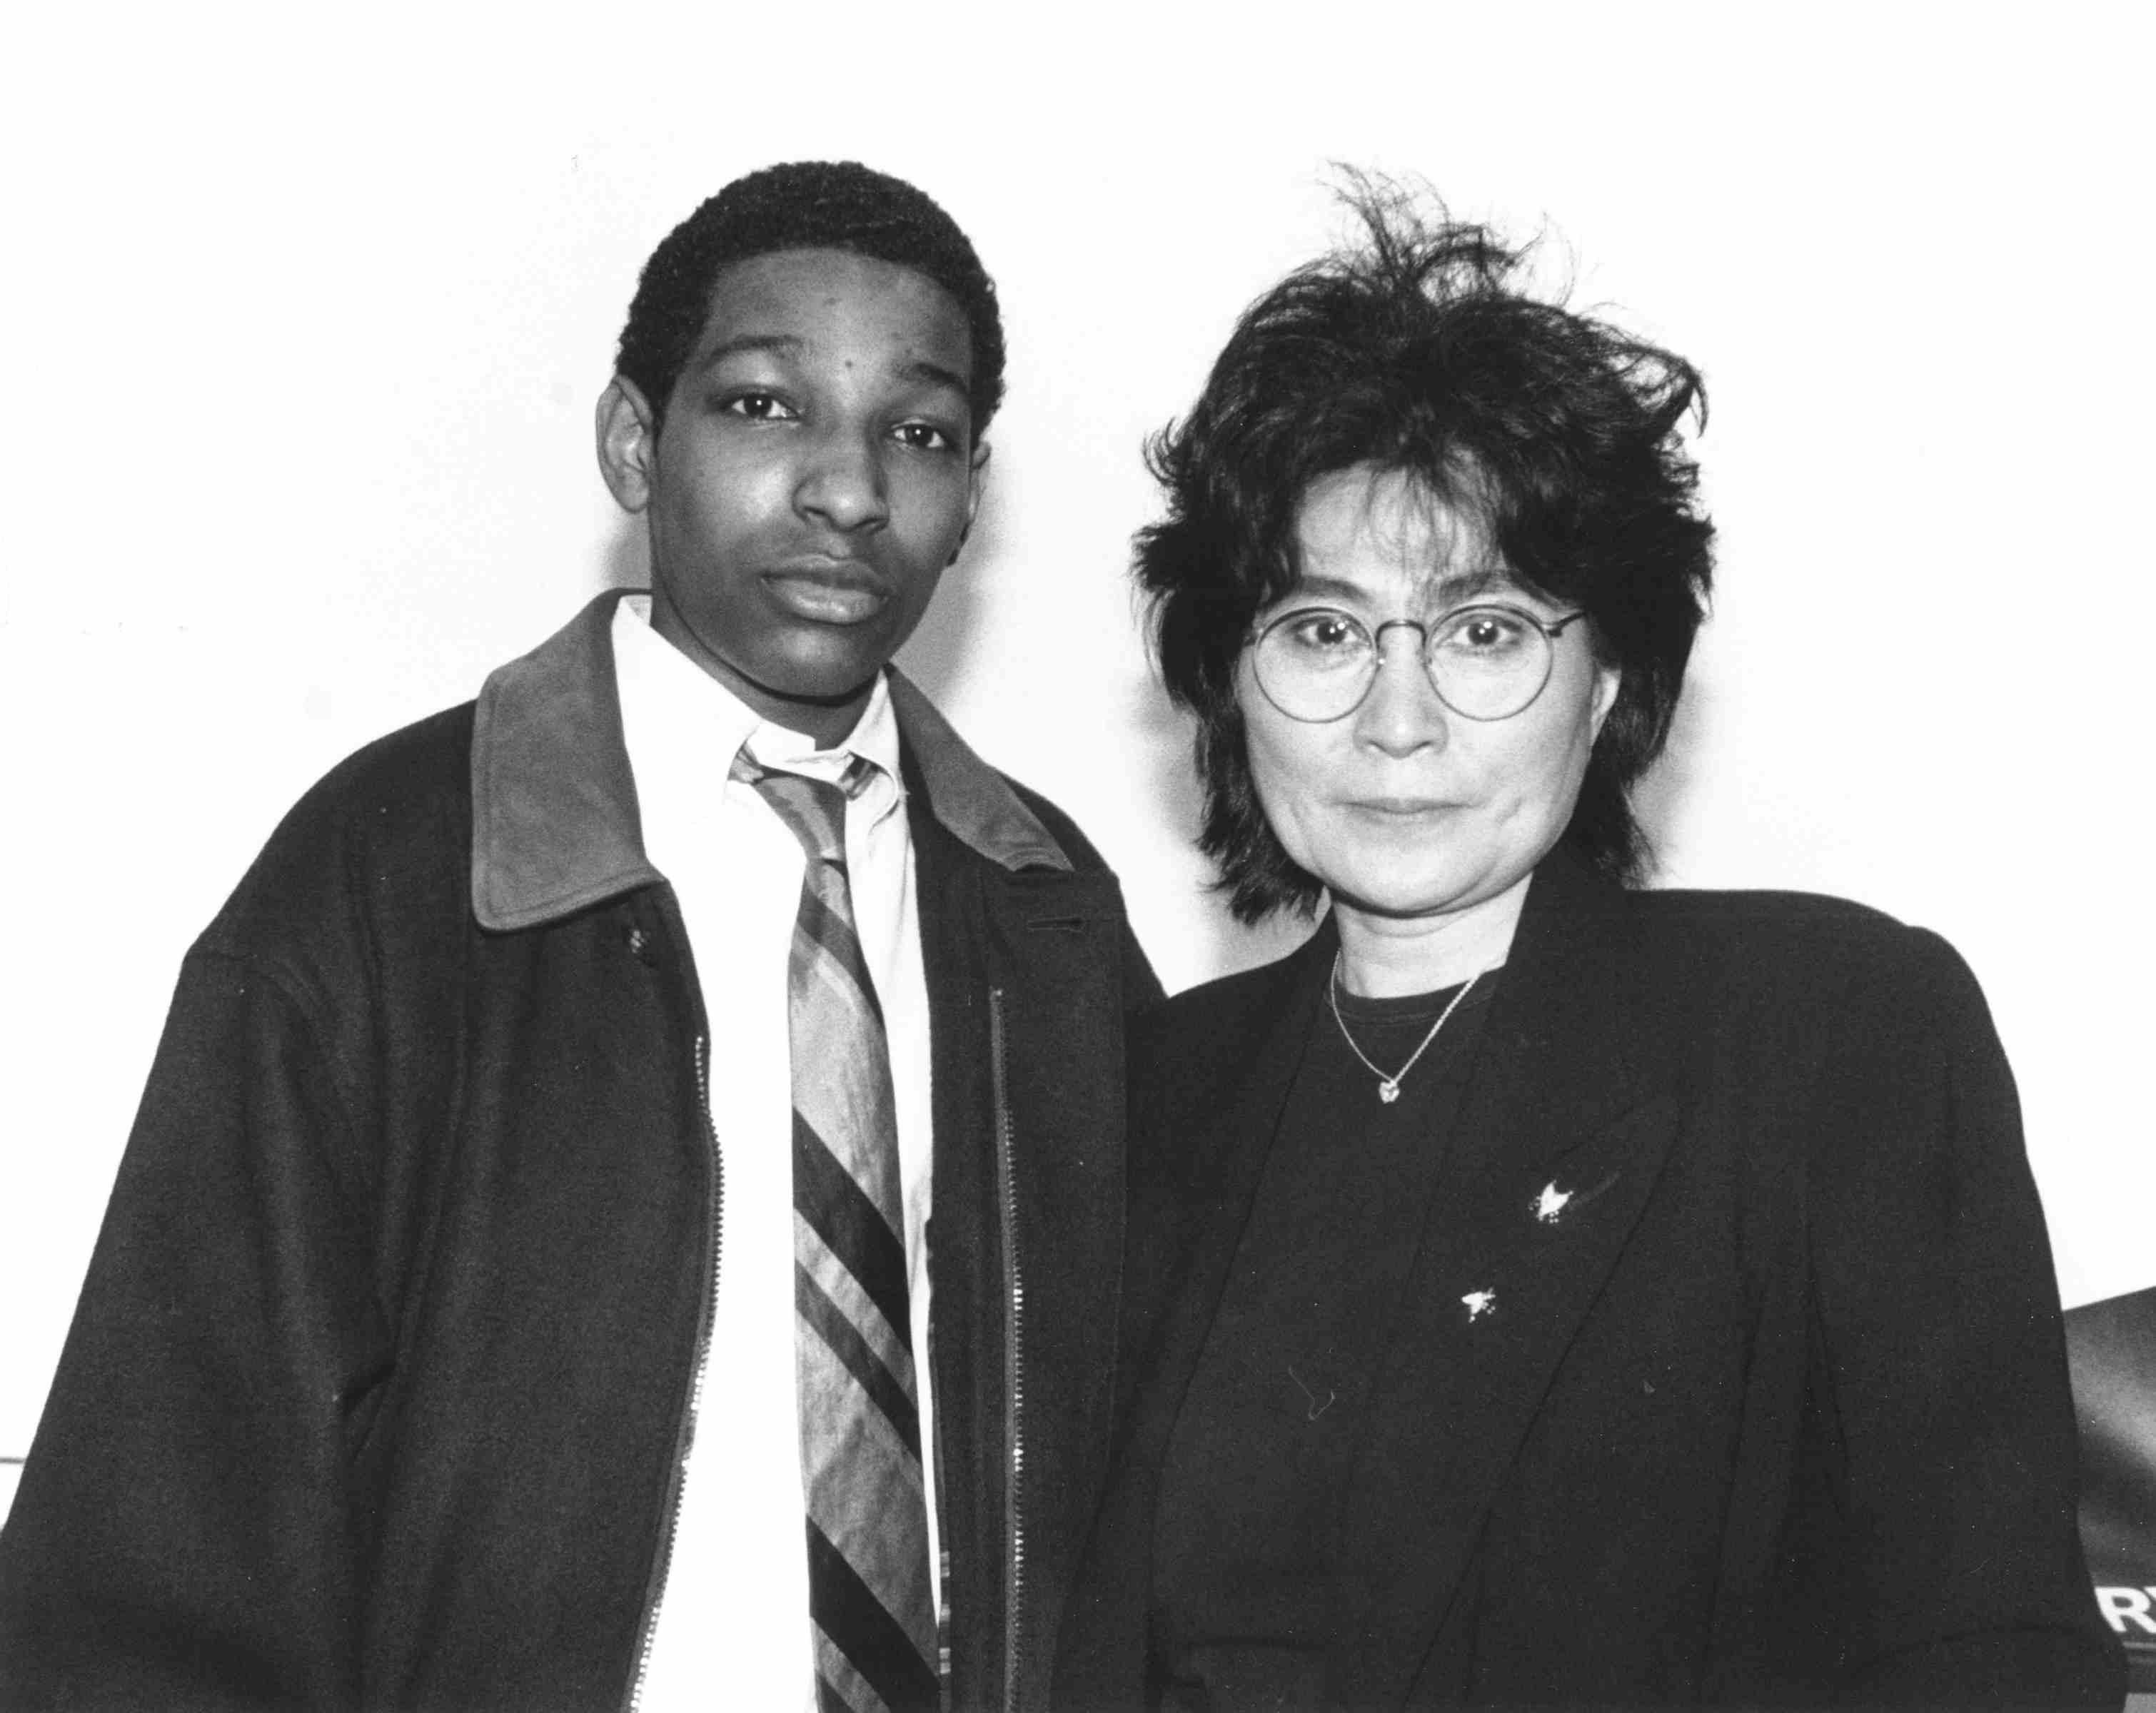 Chi-Ali with Yoko Ono 1992